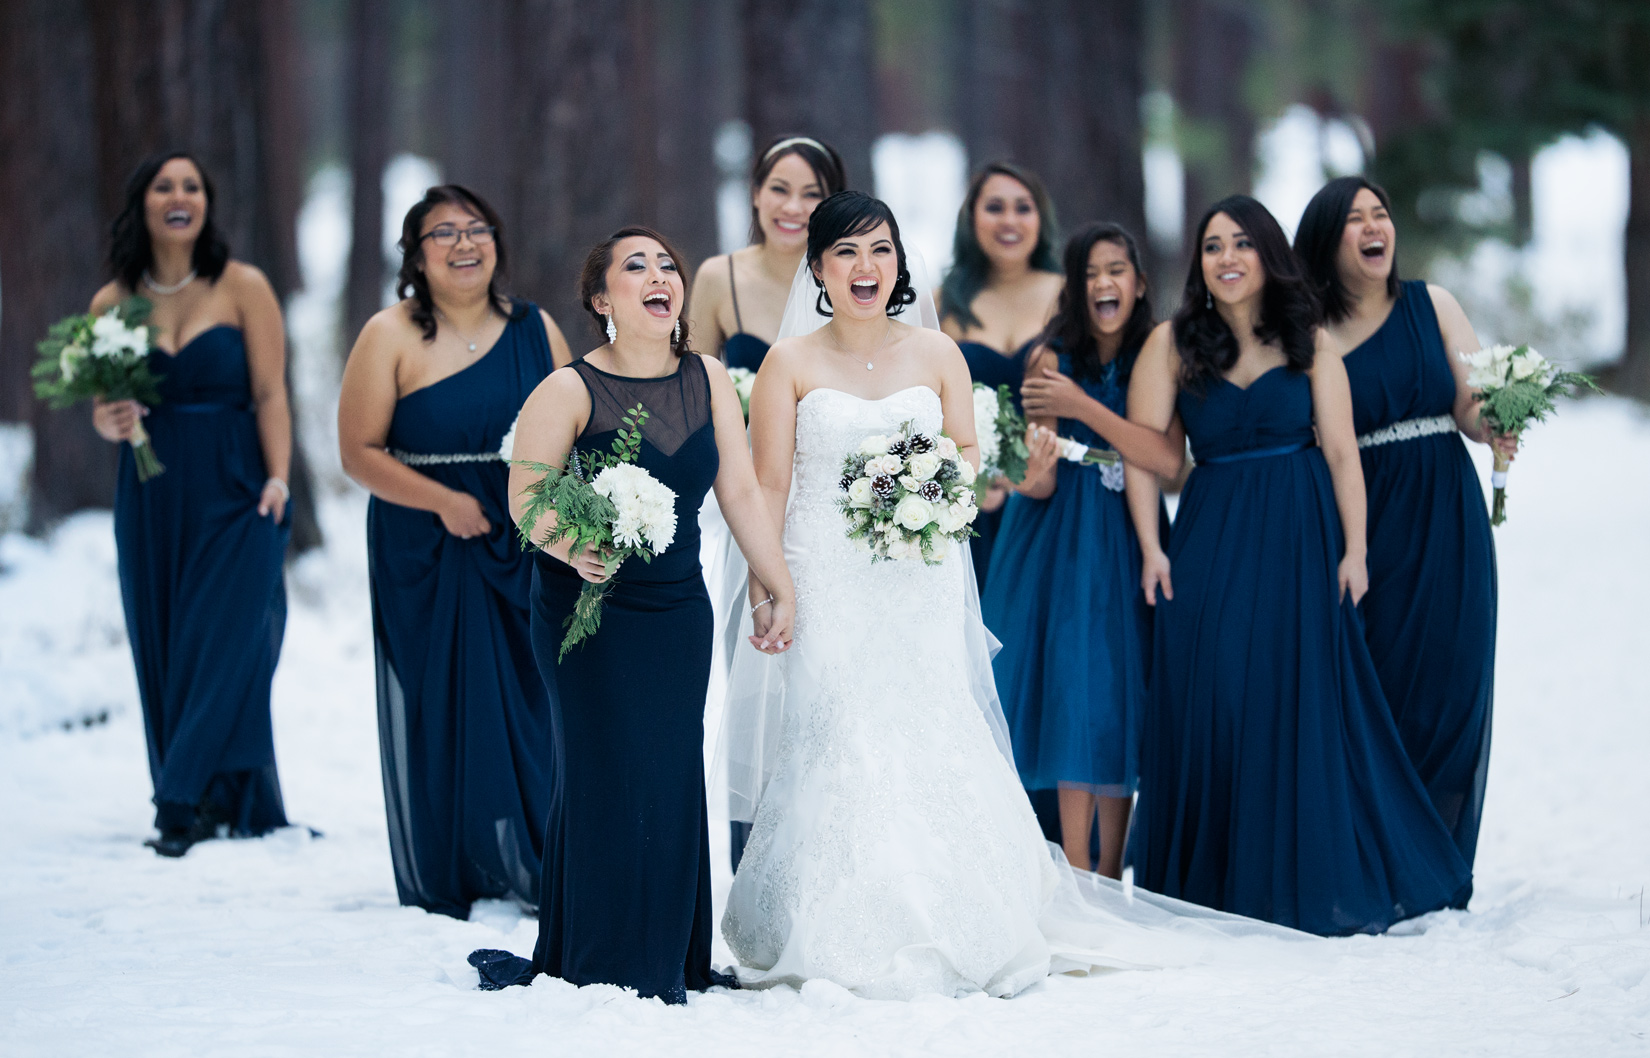 south-tahoe-winter-wedding